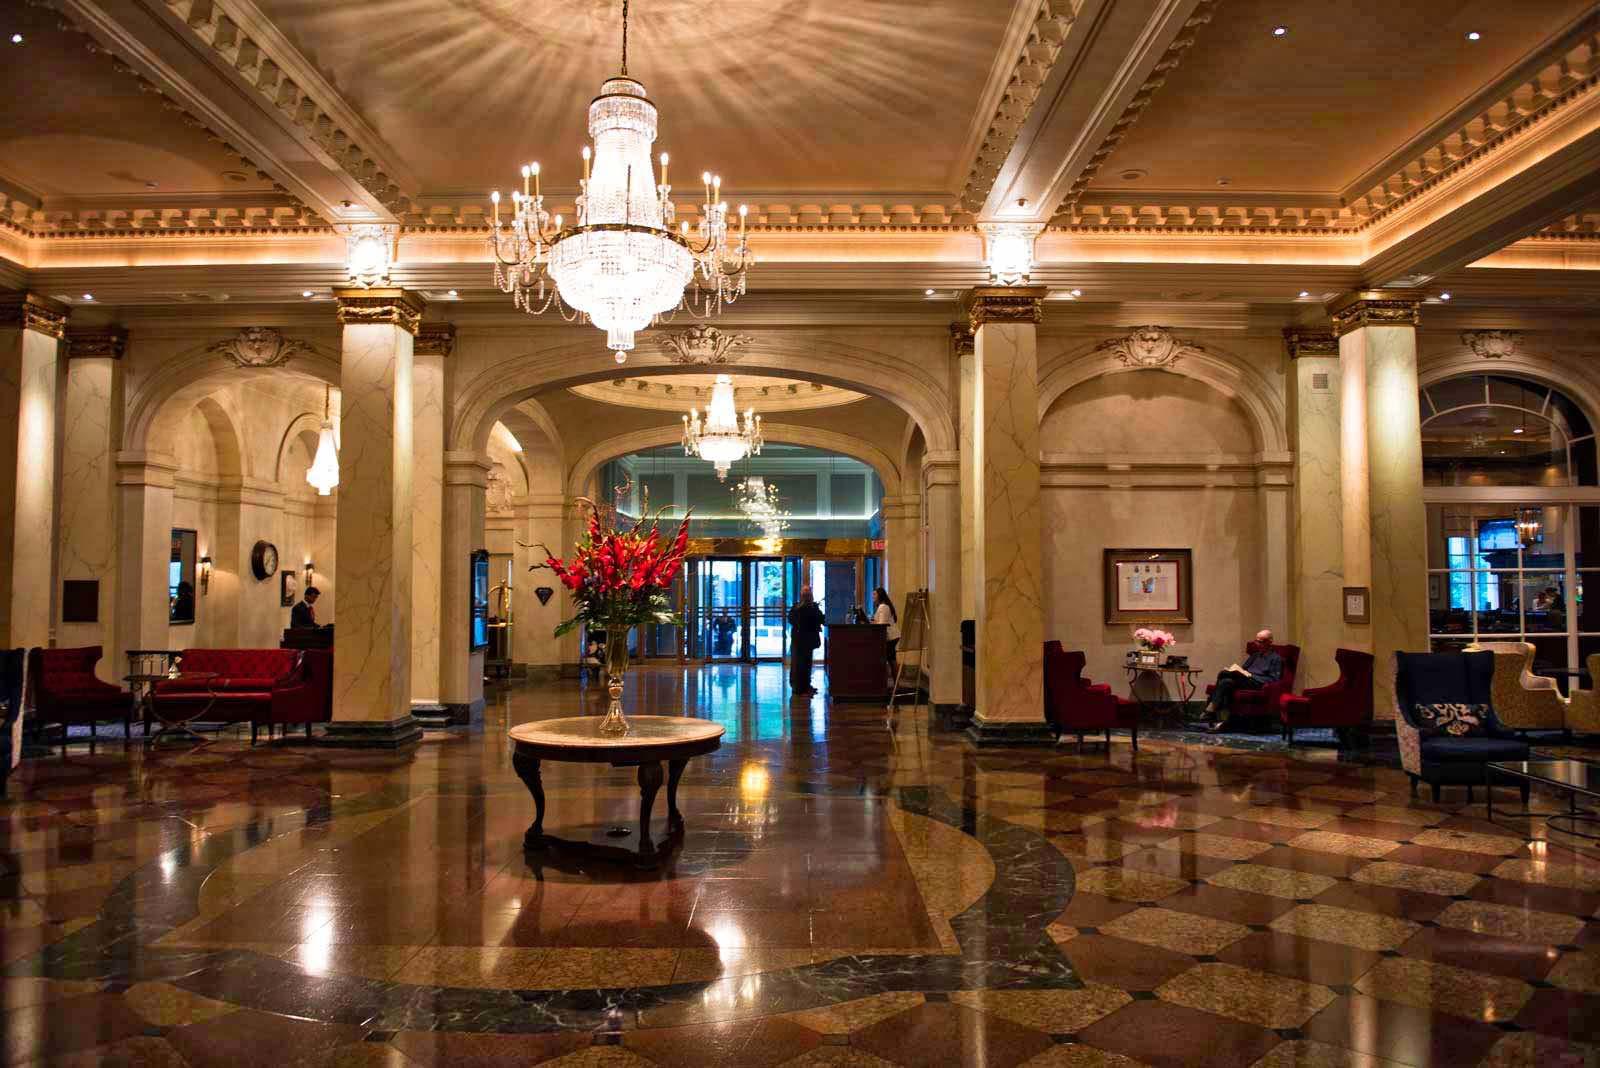 Der Empfang im Fairmont Palliser Hotel Calgary.